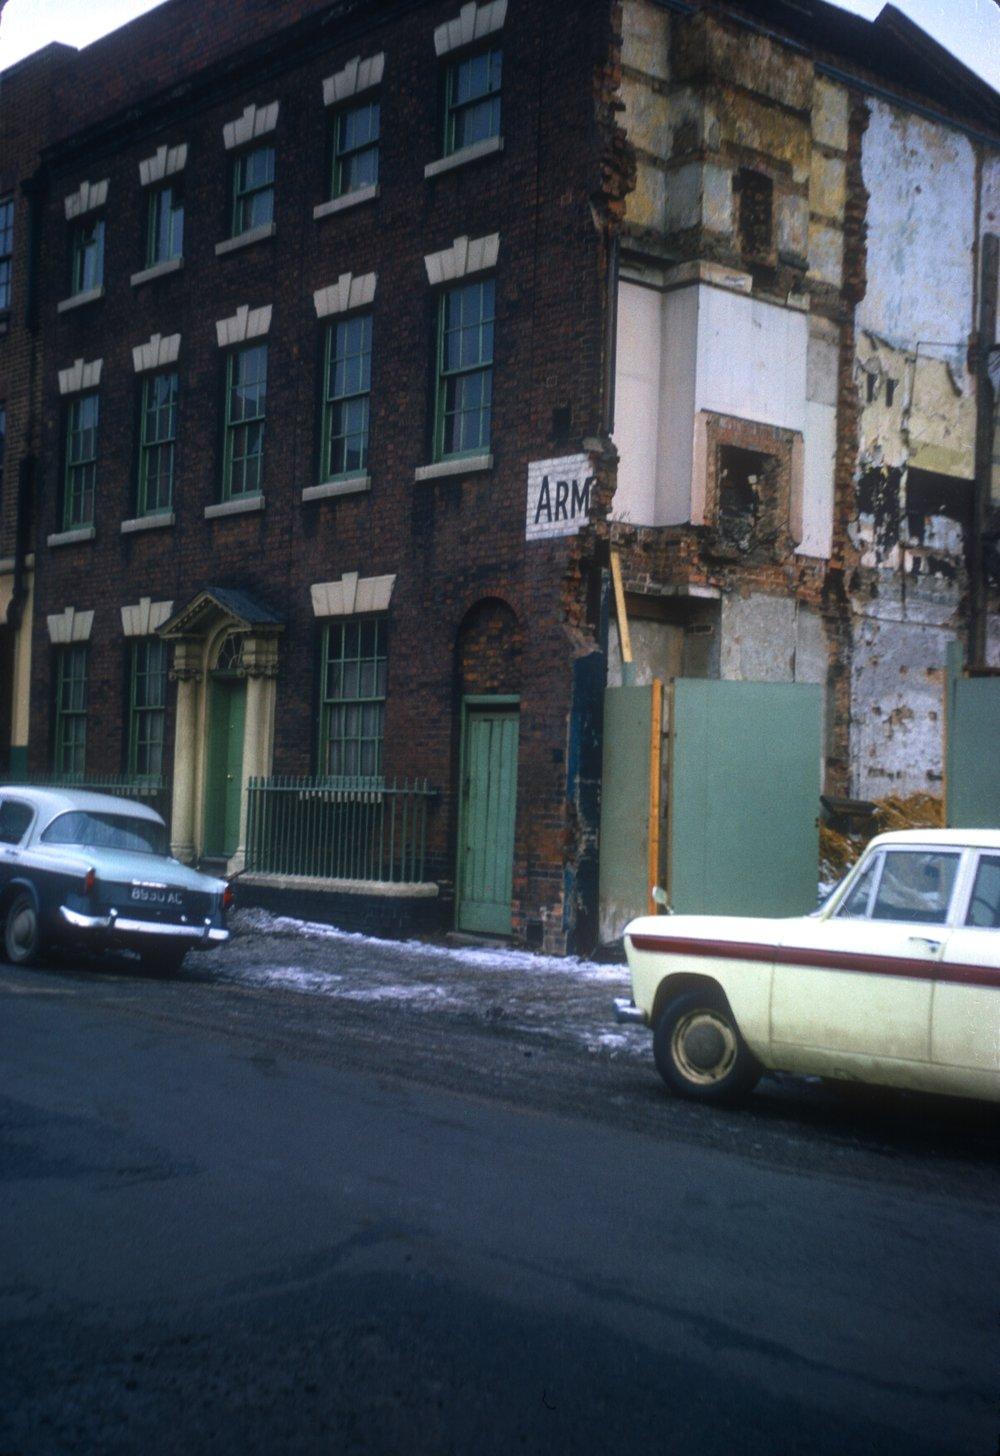 Gun Quarter (In decay). No.16 Whittall Street. 16th February 1963